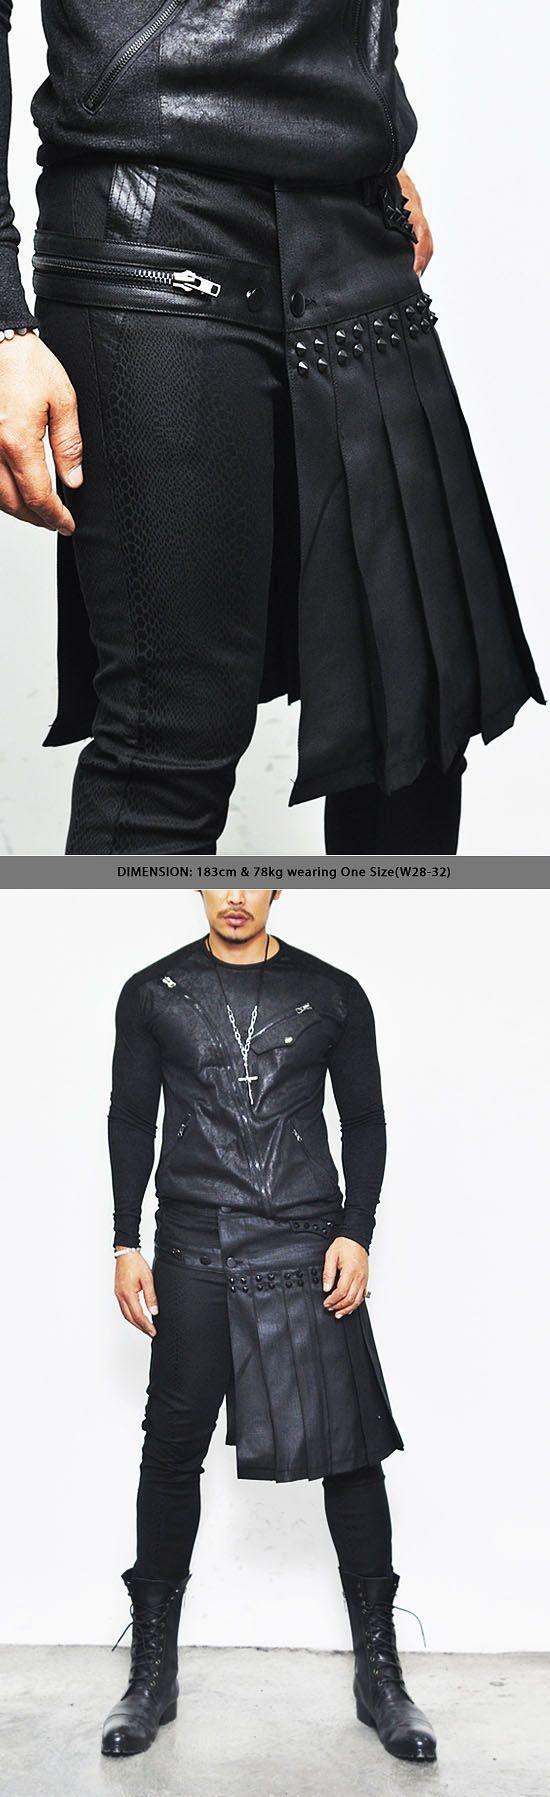 AVANT GARDE HAUTE COUTURE | Details about Avant-garde Haute Couture Mens Fleated Gladiator Wrap ... #Fashion